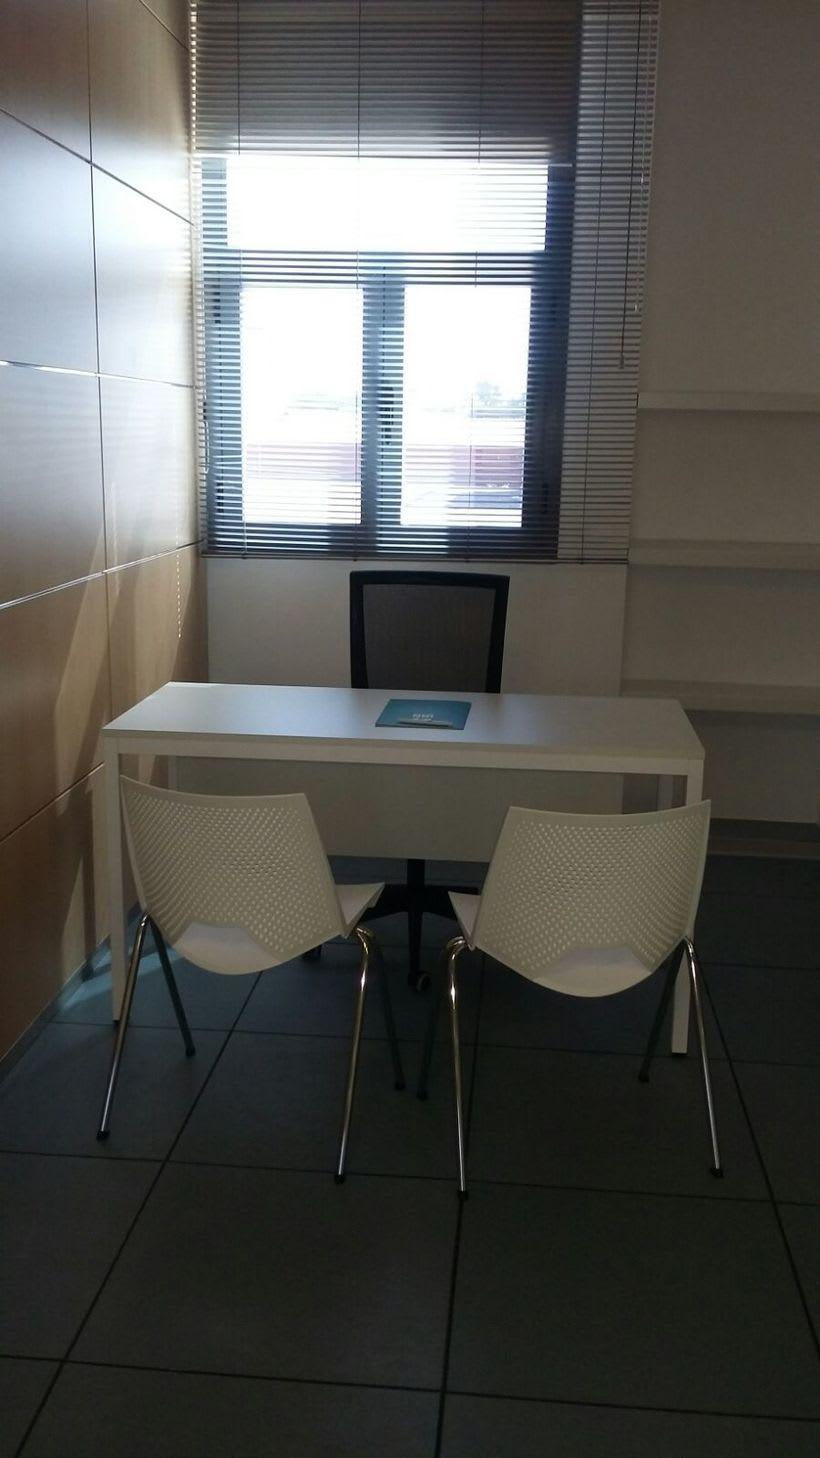 Centro de Negocios Inn Offices Aeropuerto despachos desde 350€/mes, salas reunión 15€/hora, salas formación o conferencias desde 20€/hora (dependiendo de aforo), Co-working  120€/mes, oficina virtual básica 40€/mes  o completa 75€/mes (Iva no incluido) 0